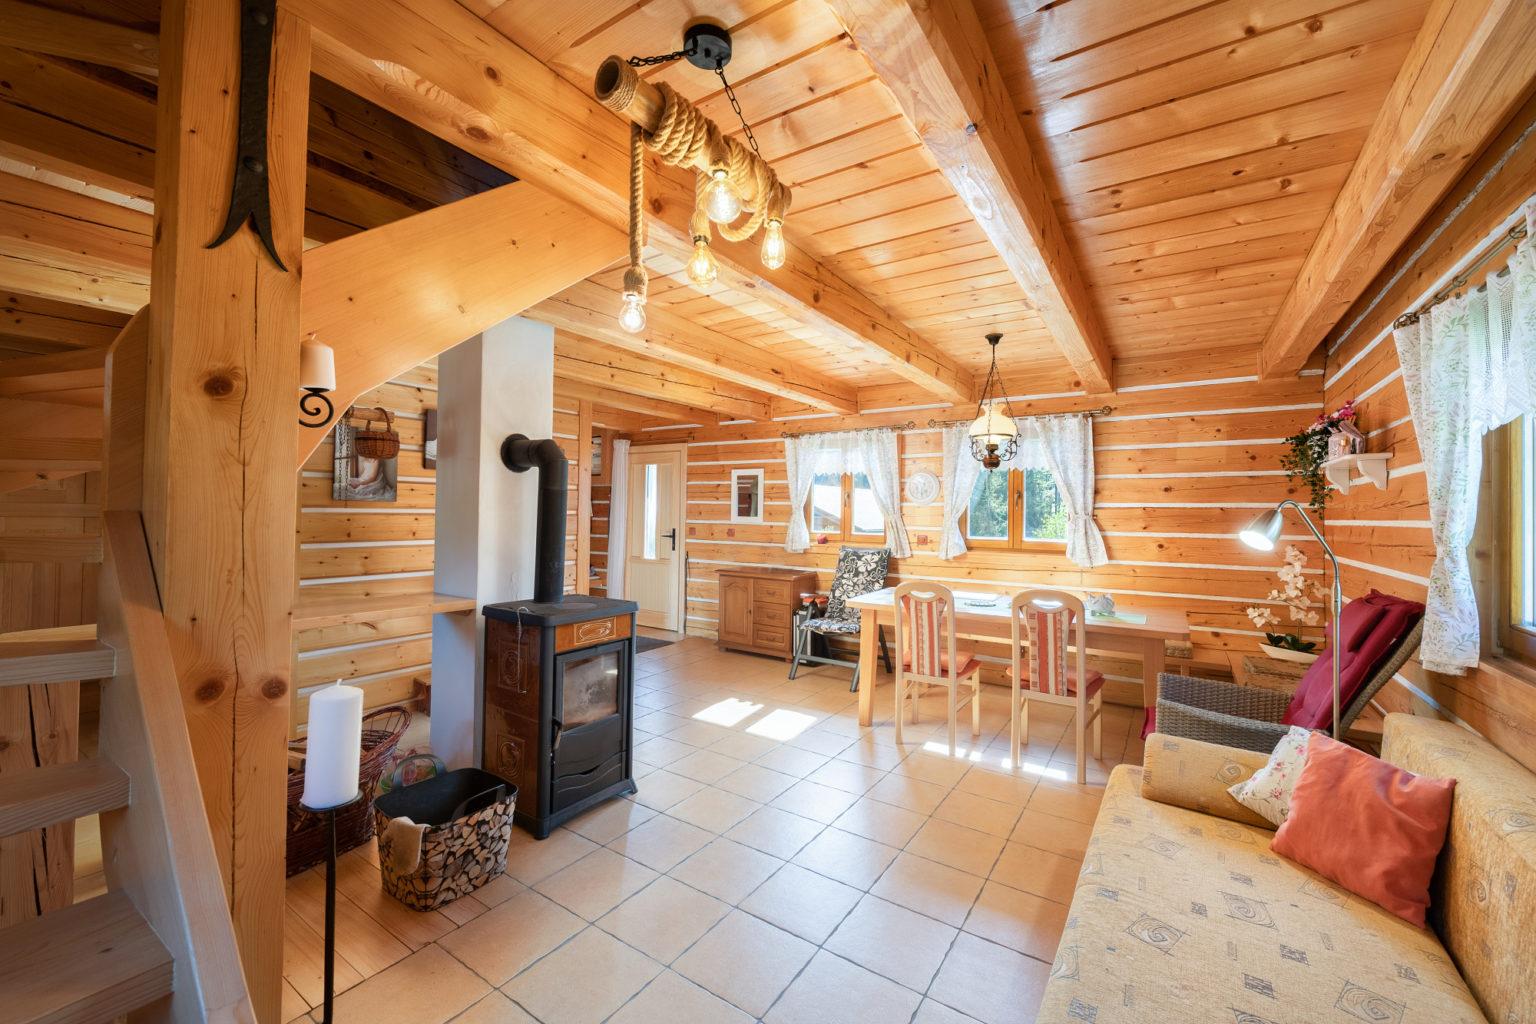 Roubená chaty interiér